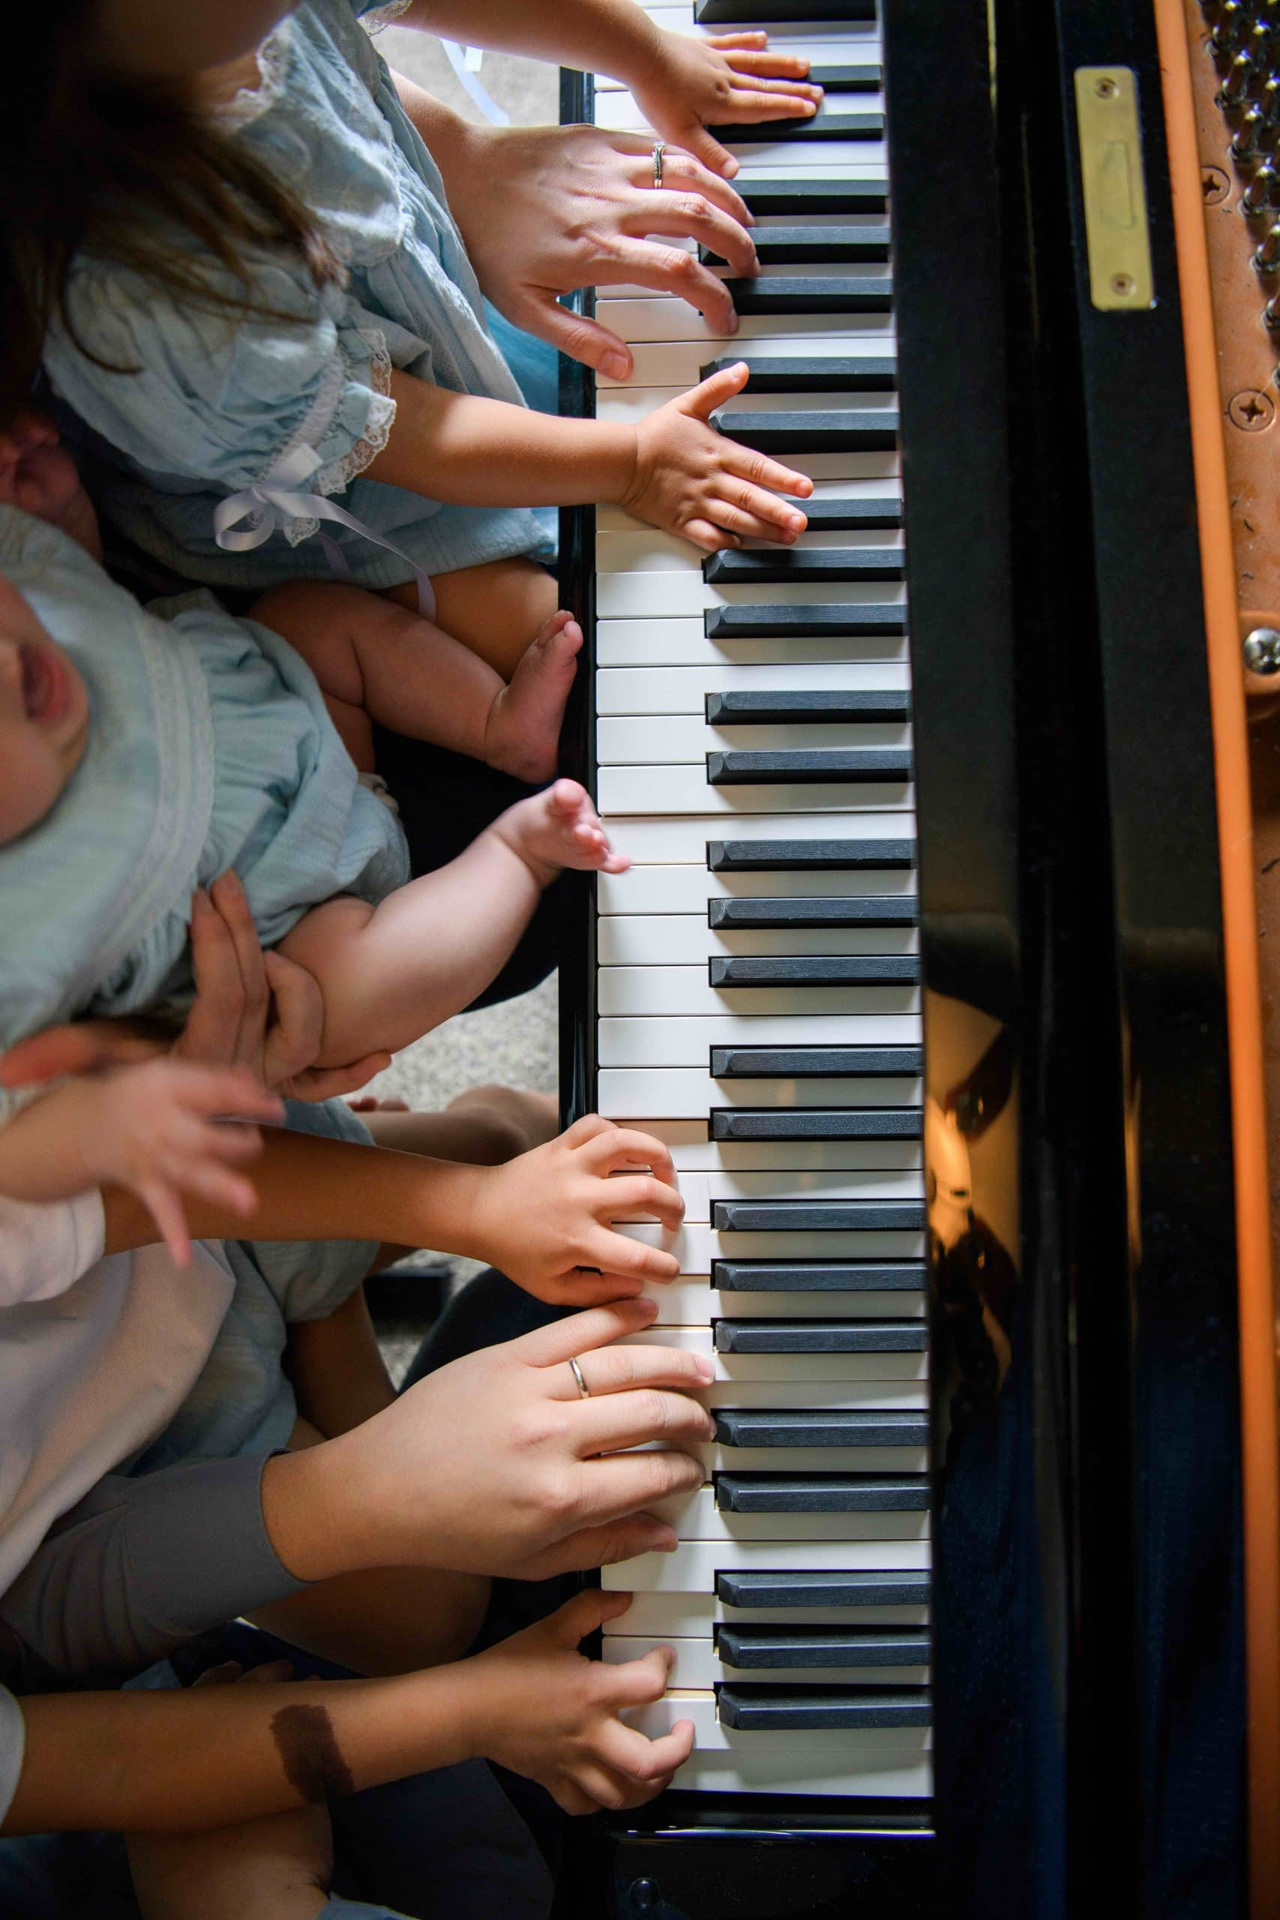 family piano hands